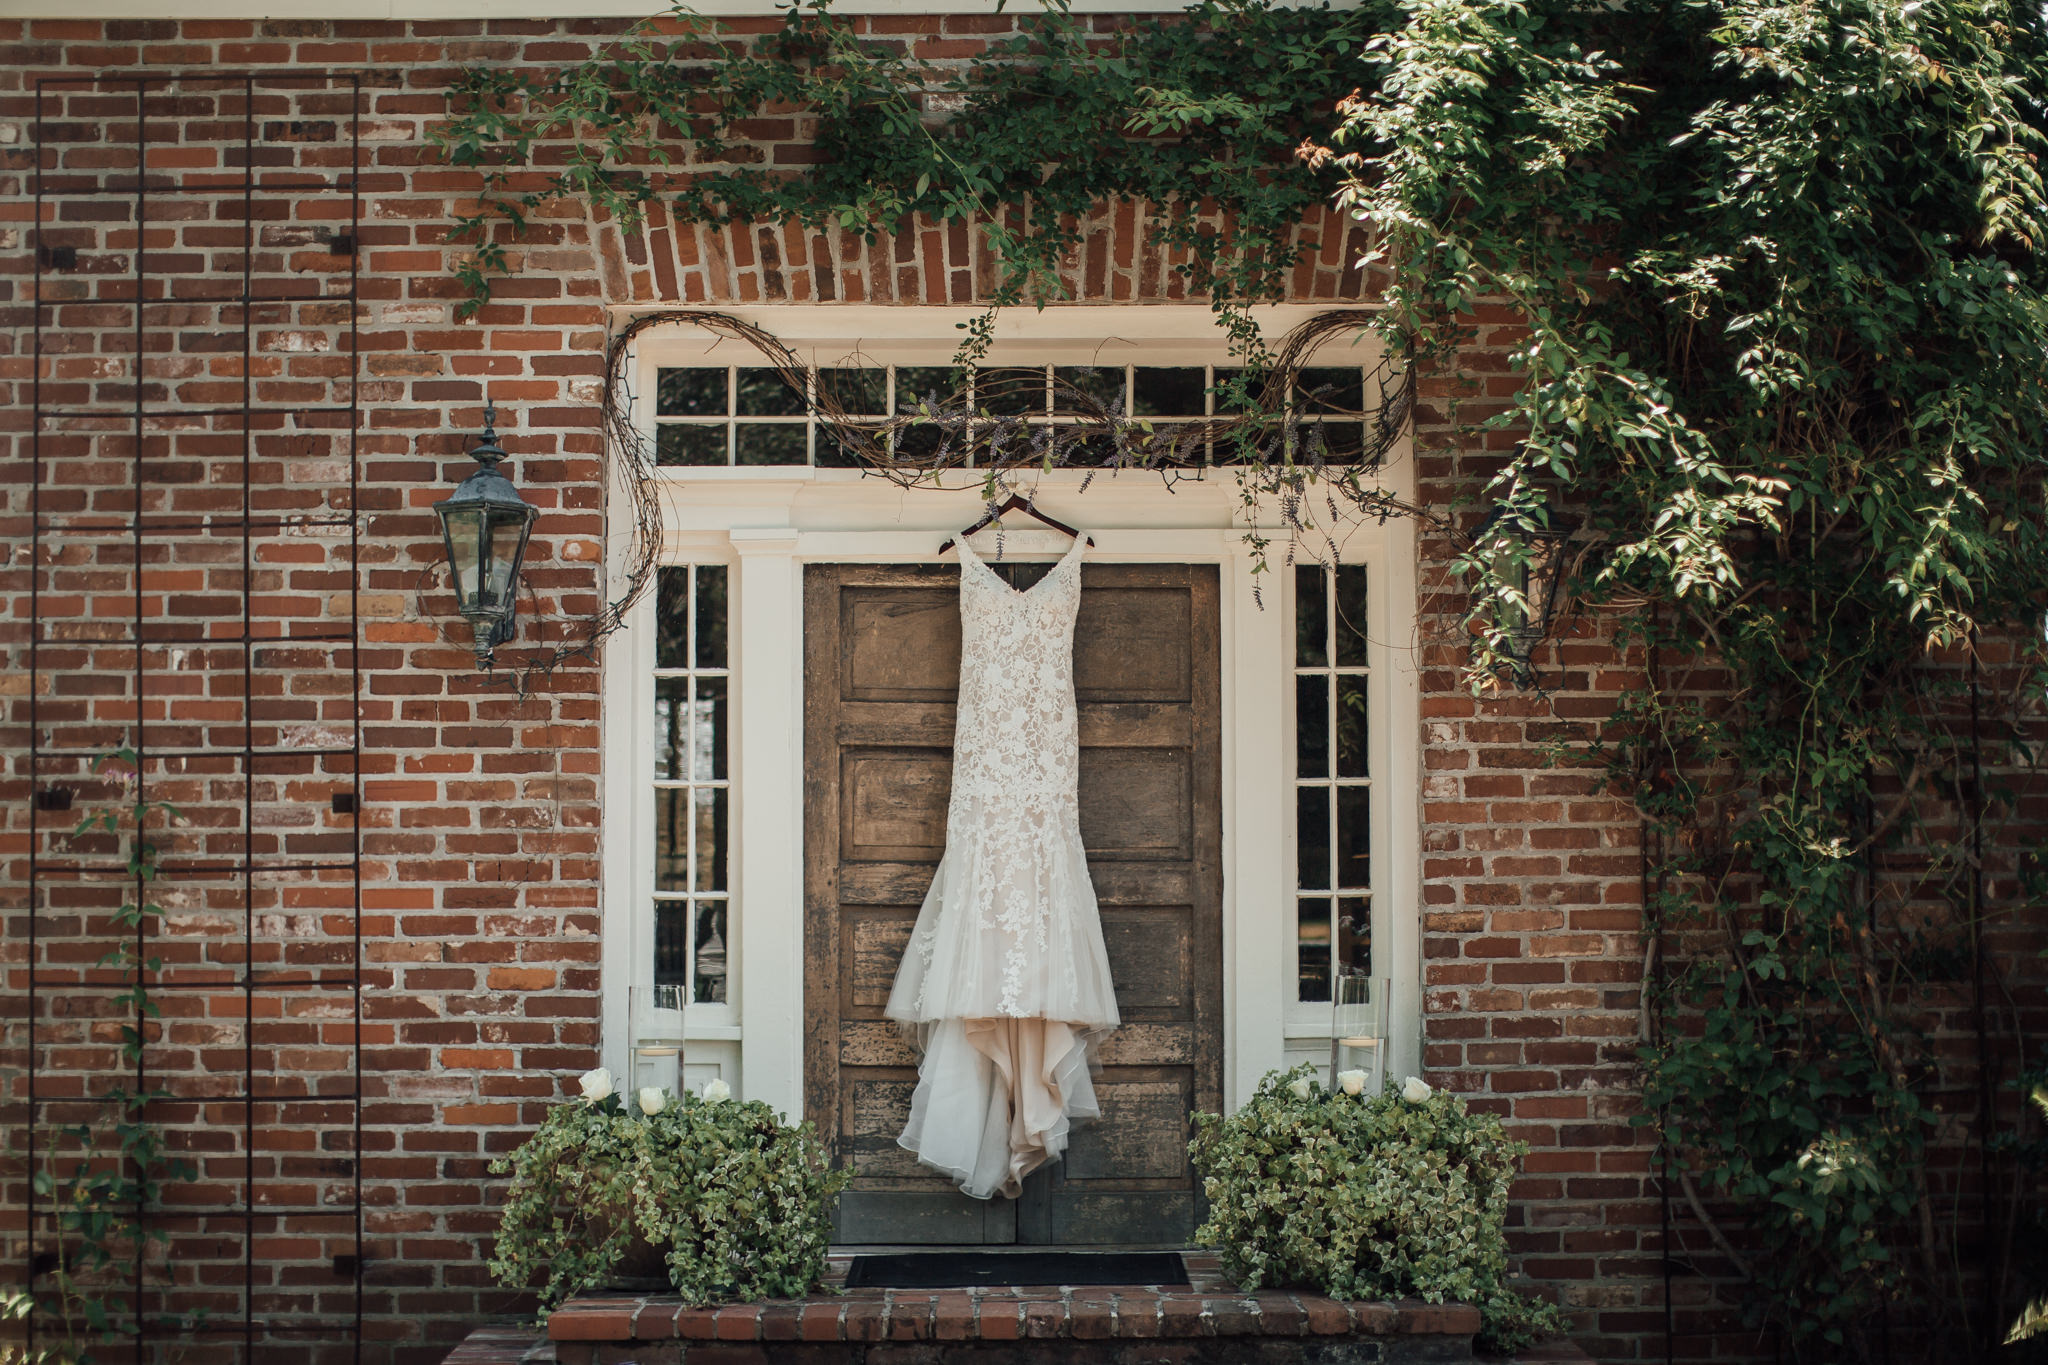 cassie-cook-photography-memphis-wedding-photographer-hedge-farm-wedding-venue-56.jpg